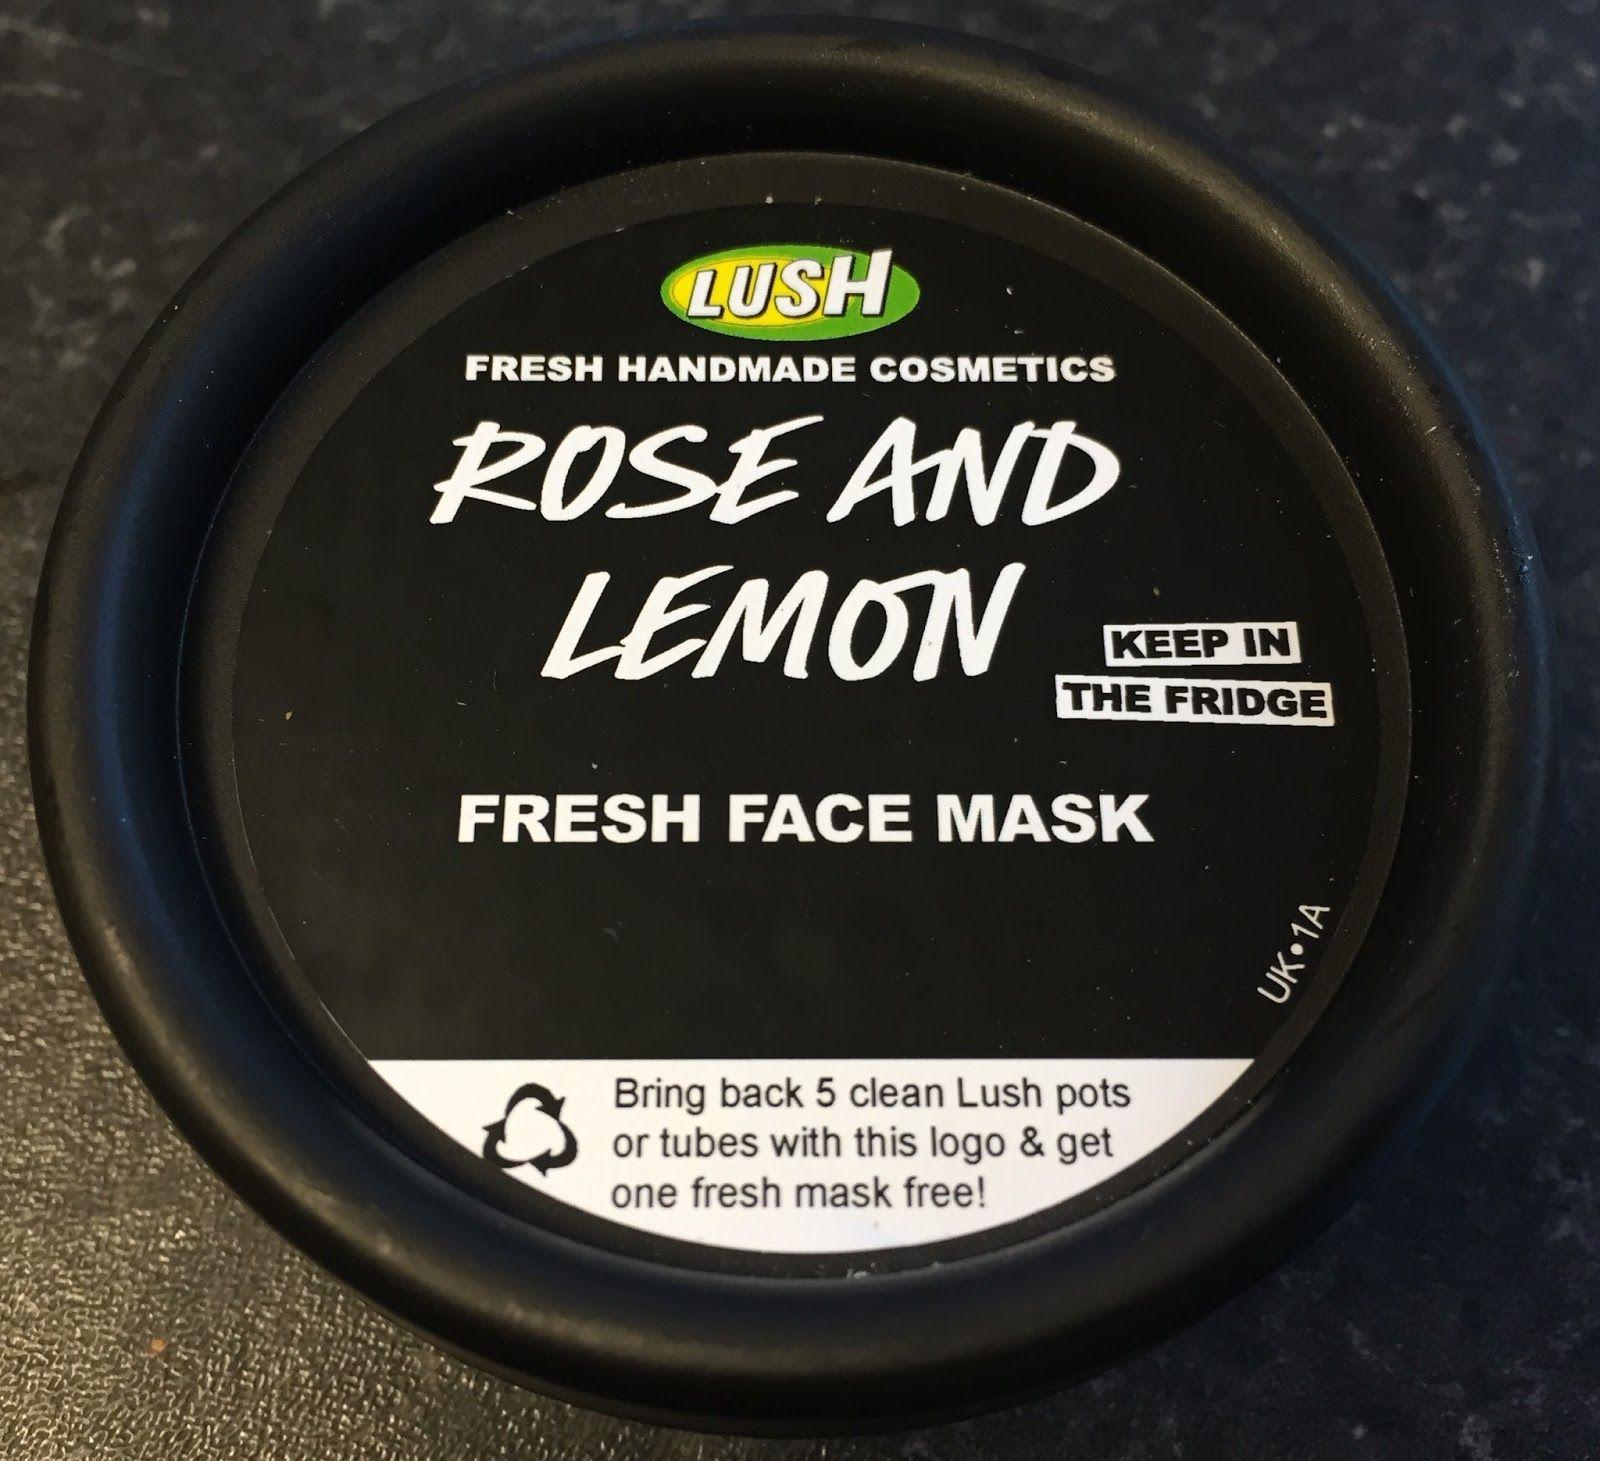 Rose and Lemon Fresh Face Mask | Lush